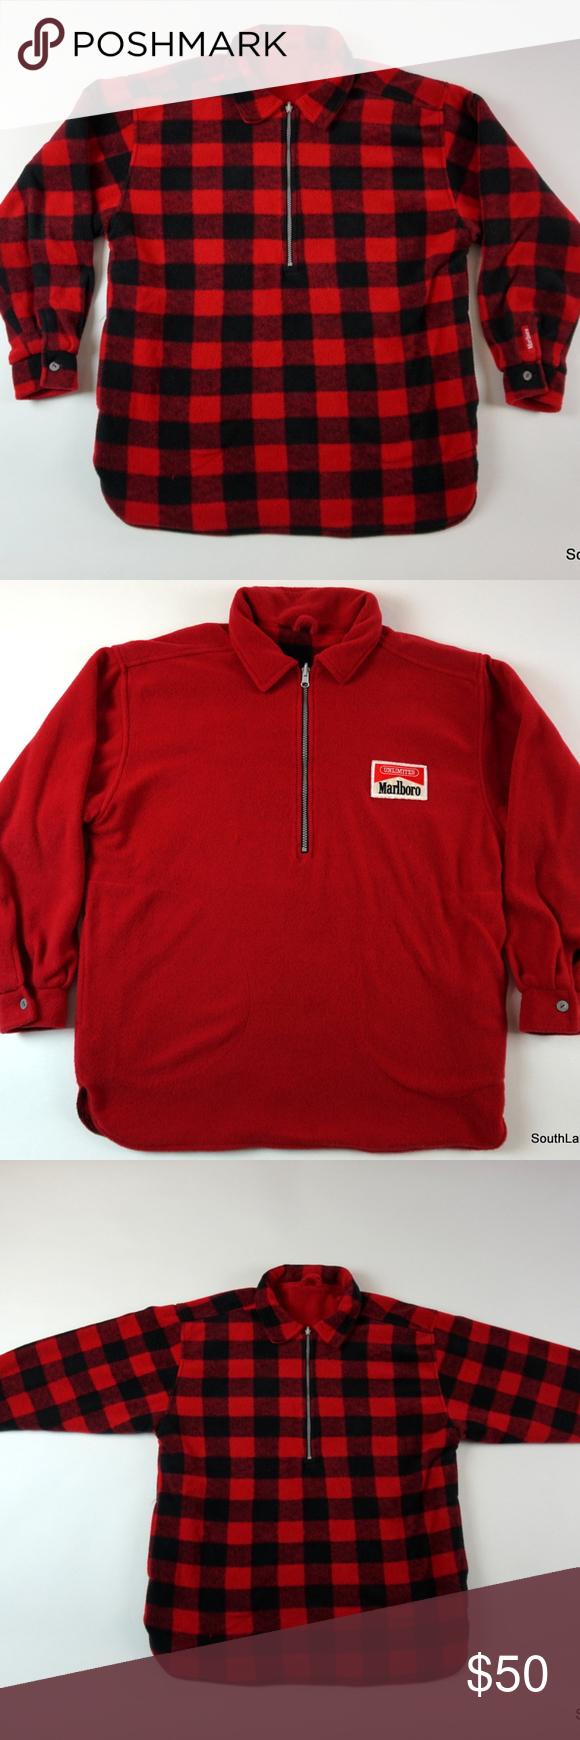 Vintage Marlboro Reversible Fleece Jacket Plaid Xl Vintage Marlboro Reversible Fleece Jacket Plaid Red Flannel Lined Men Fleece Jacket Jackets Marlboro Jacket